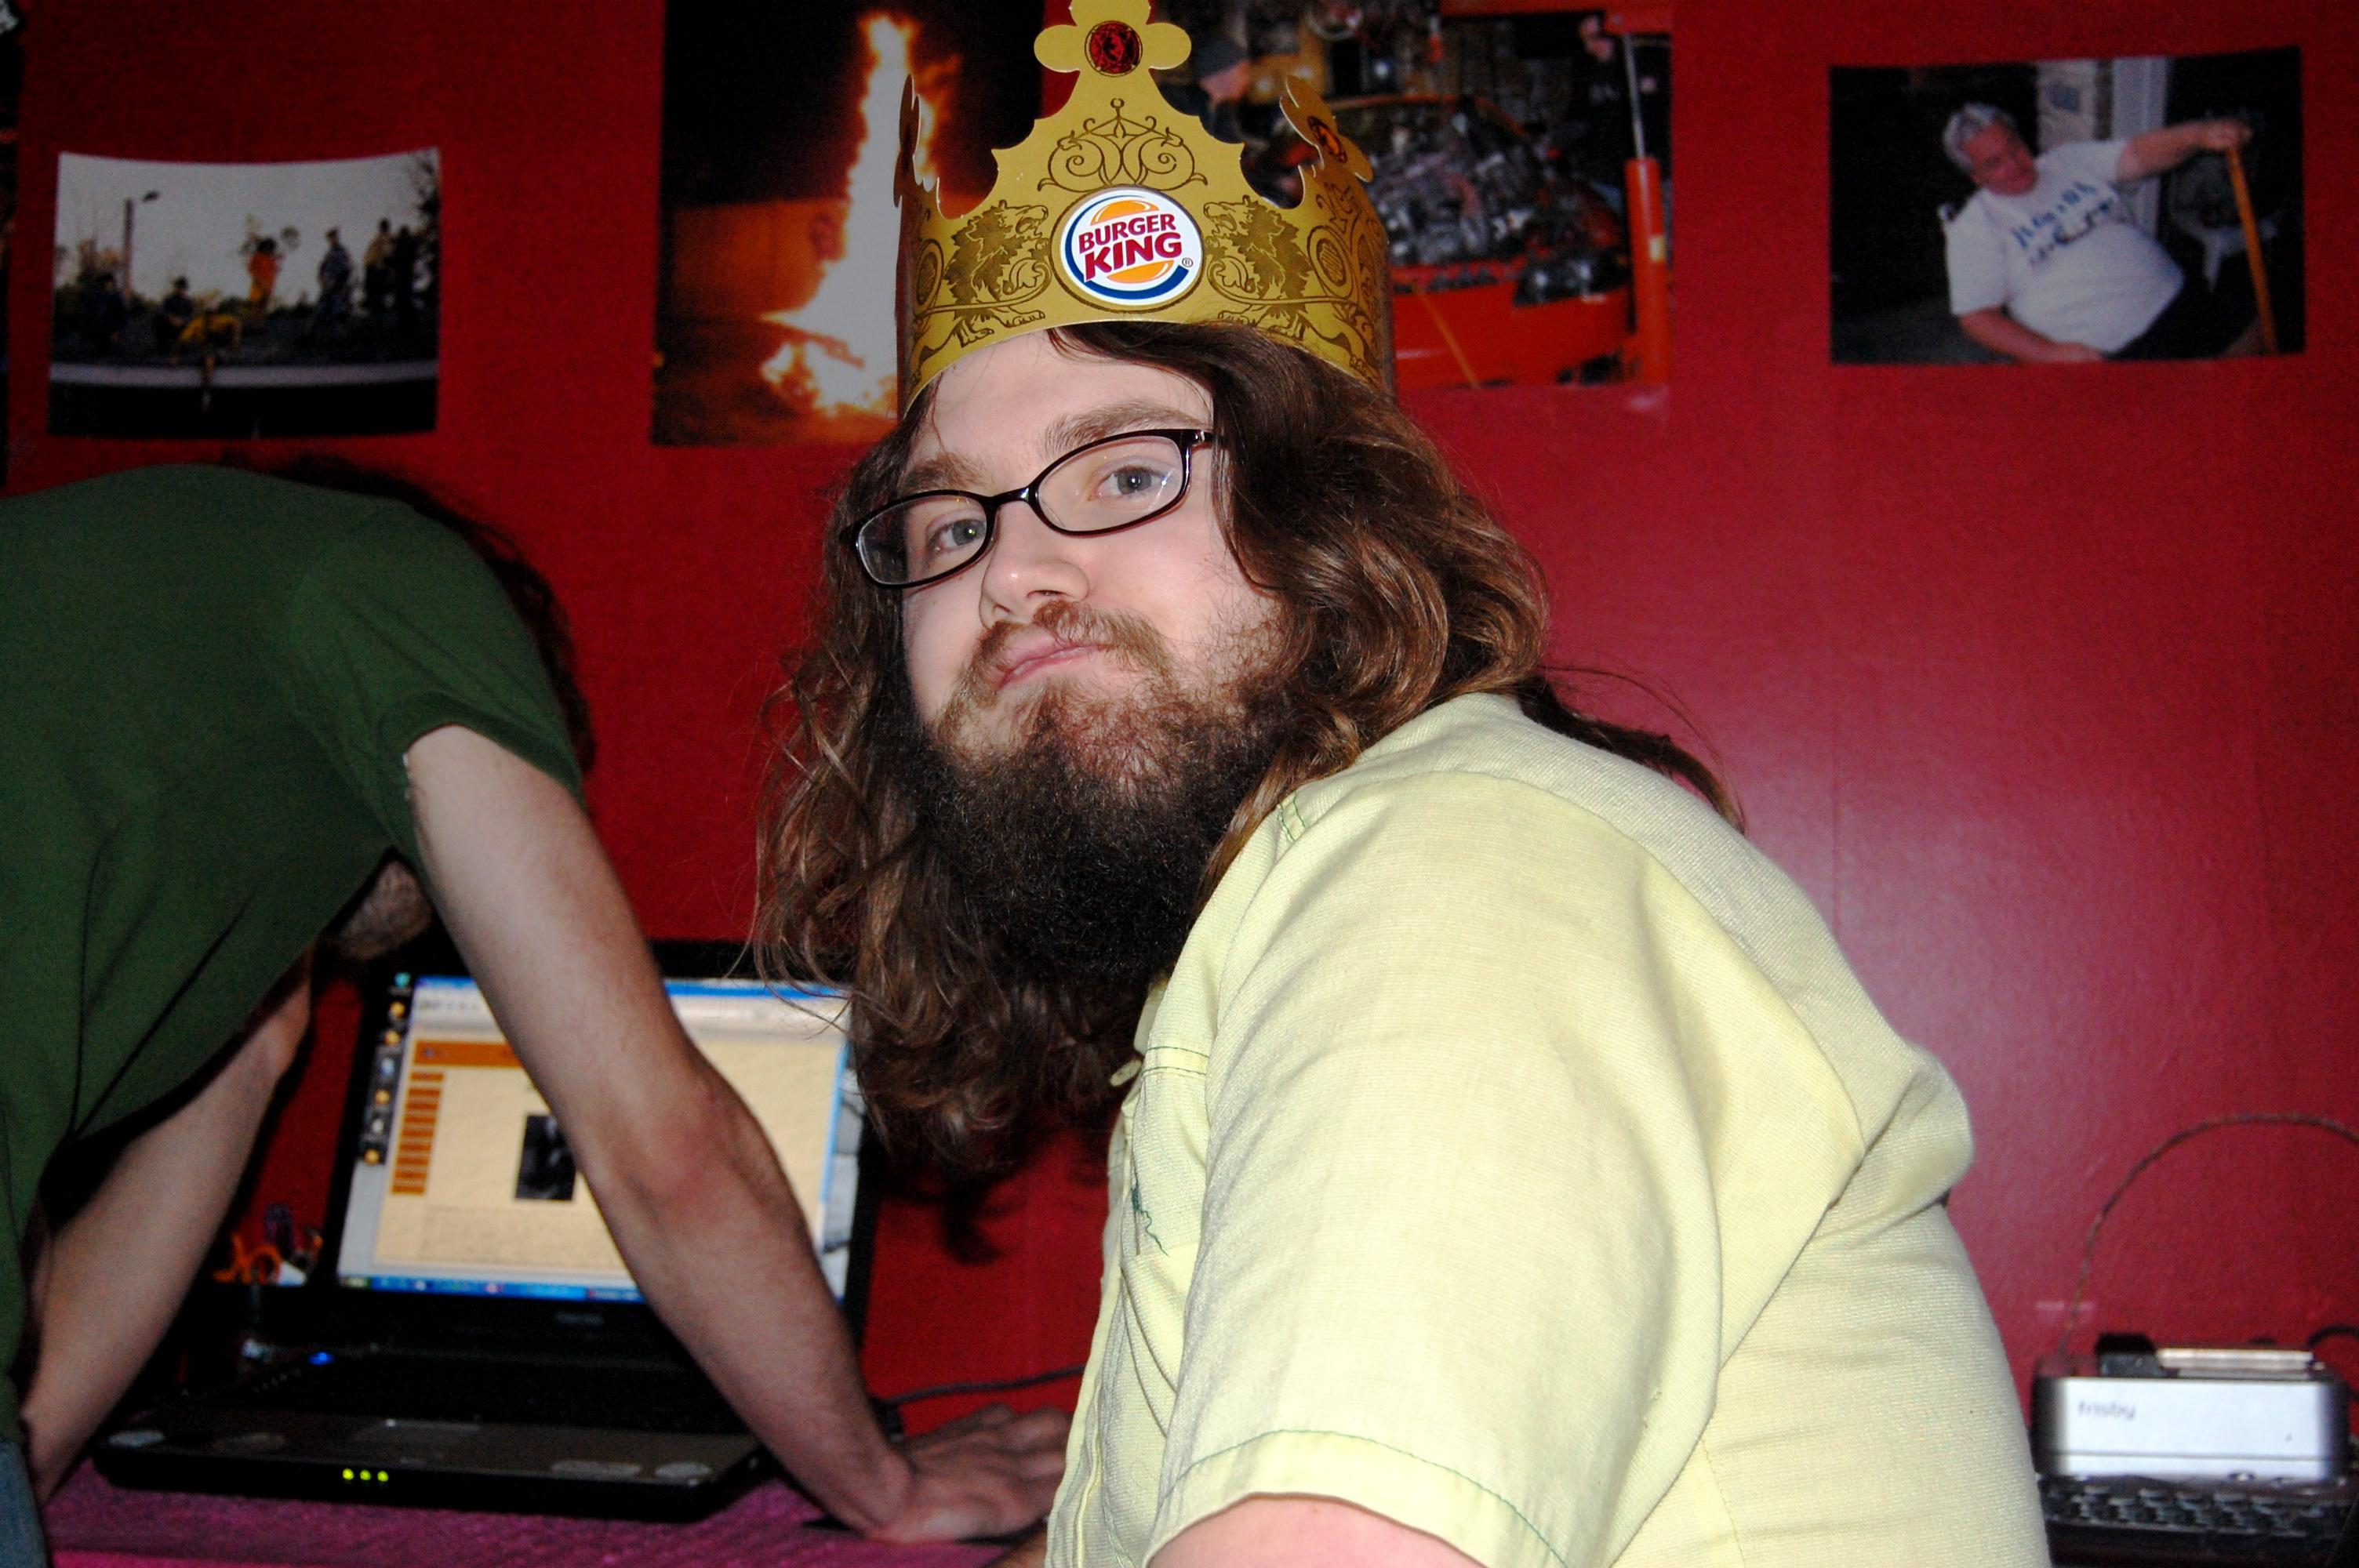 Burger King Crowns Kick At Nickserra